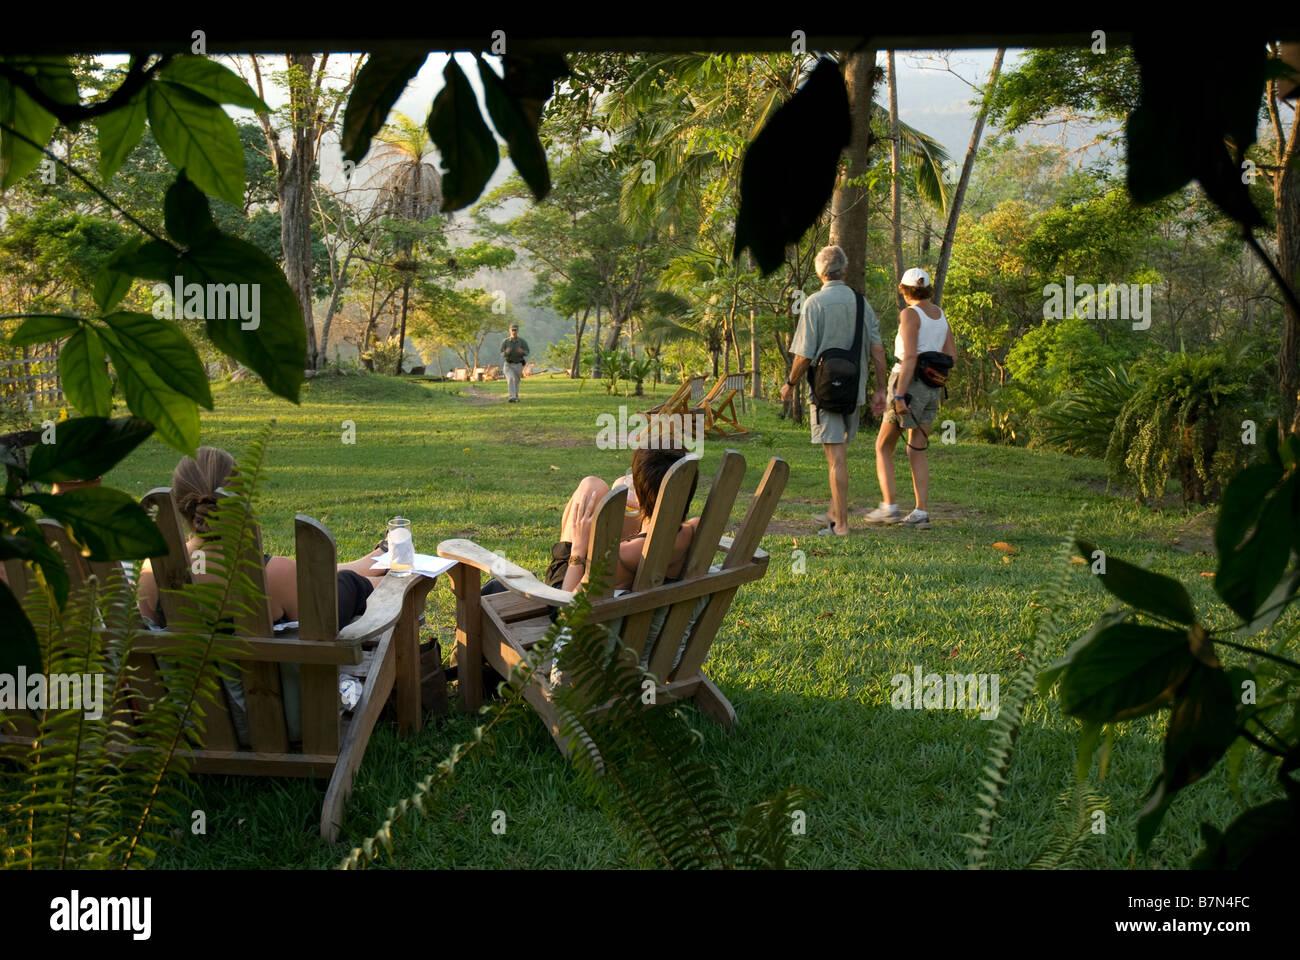 Honduras, Copan, Hacienda San Lucas eco-lodge - Stock Image